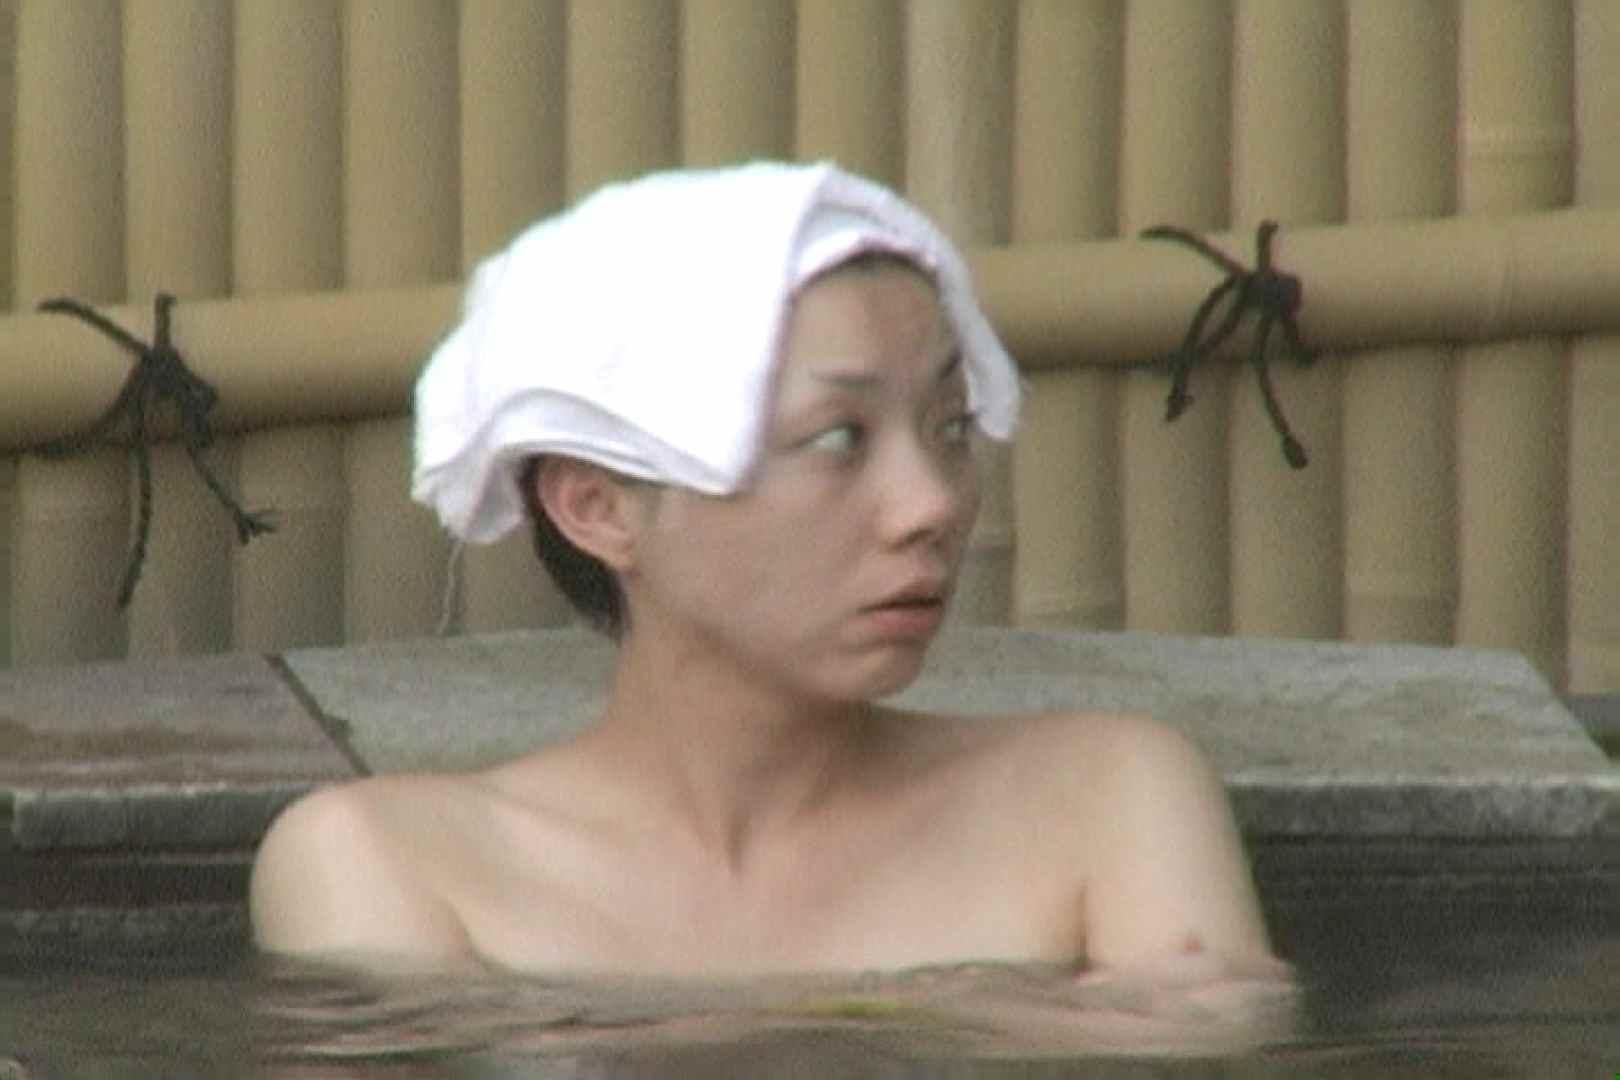 Aquaな露天風呂Vol.630 HなOL セックス無修正動画無料 87pic 58